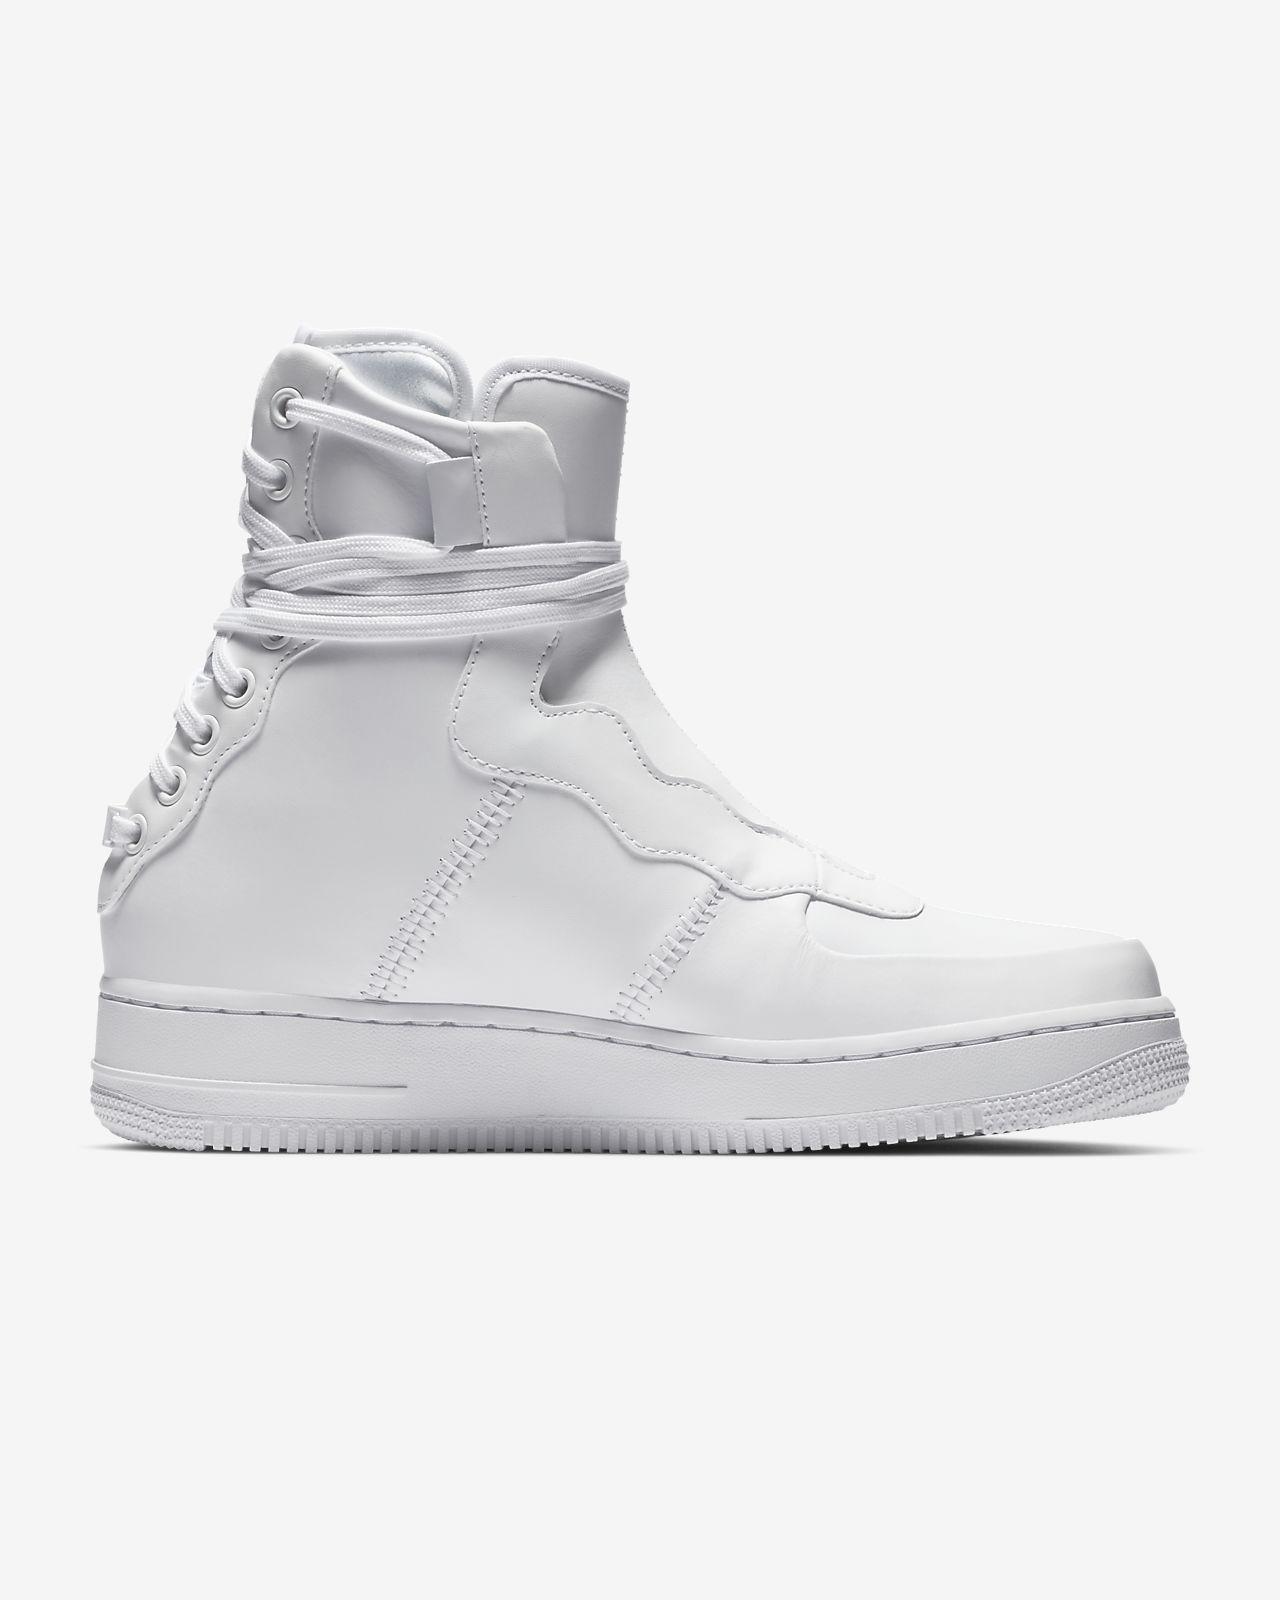 official photos a33cb 92ac9 ... Nike AF1 Rebel XX Women s Shoe